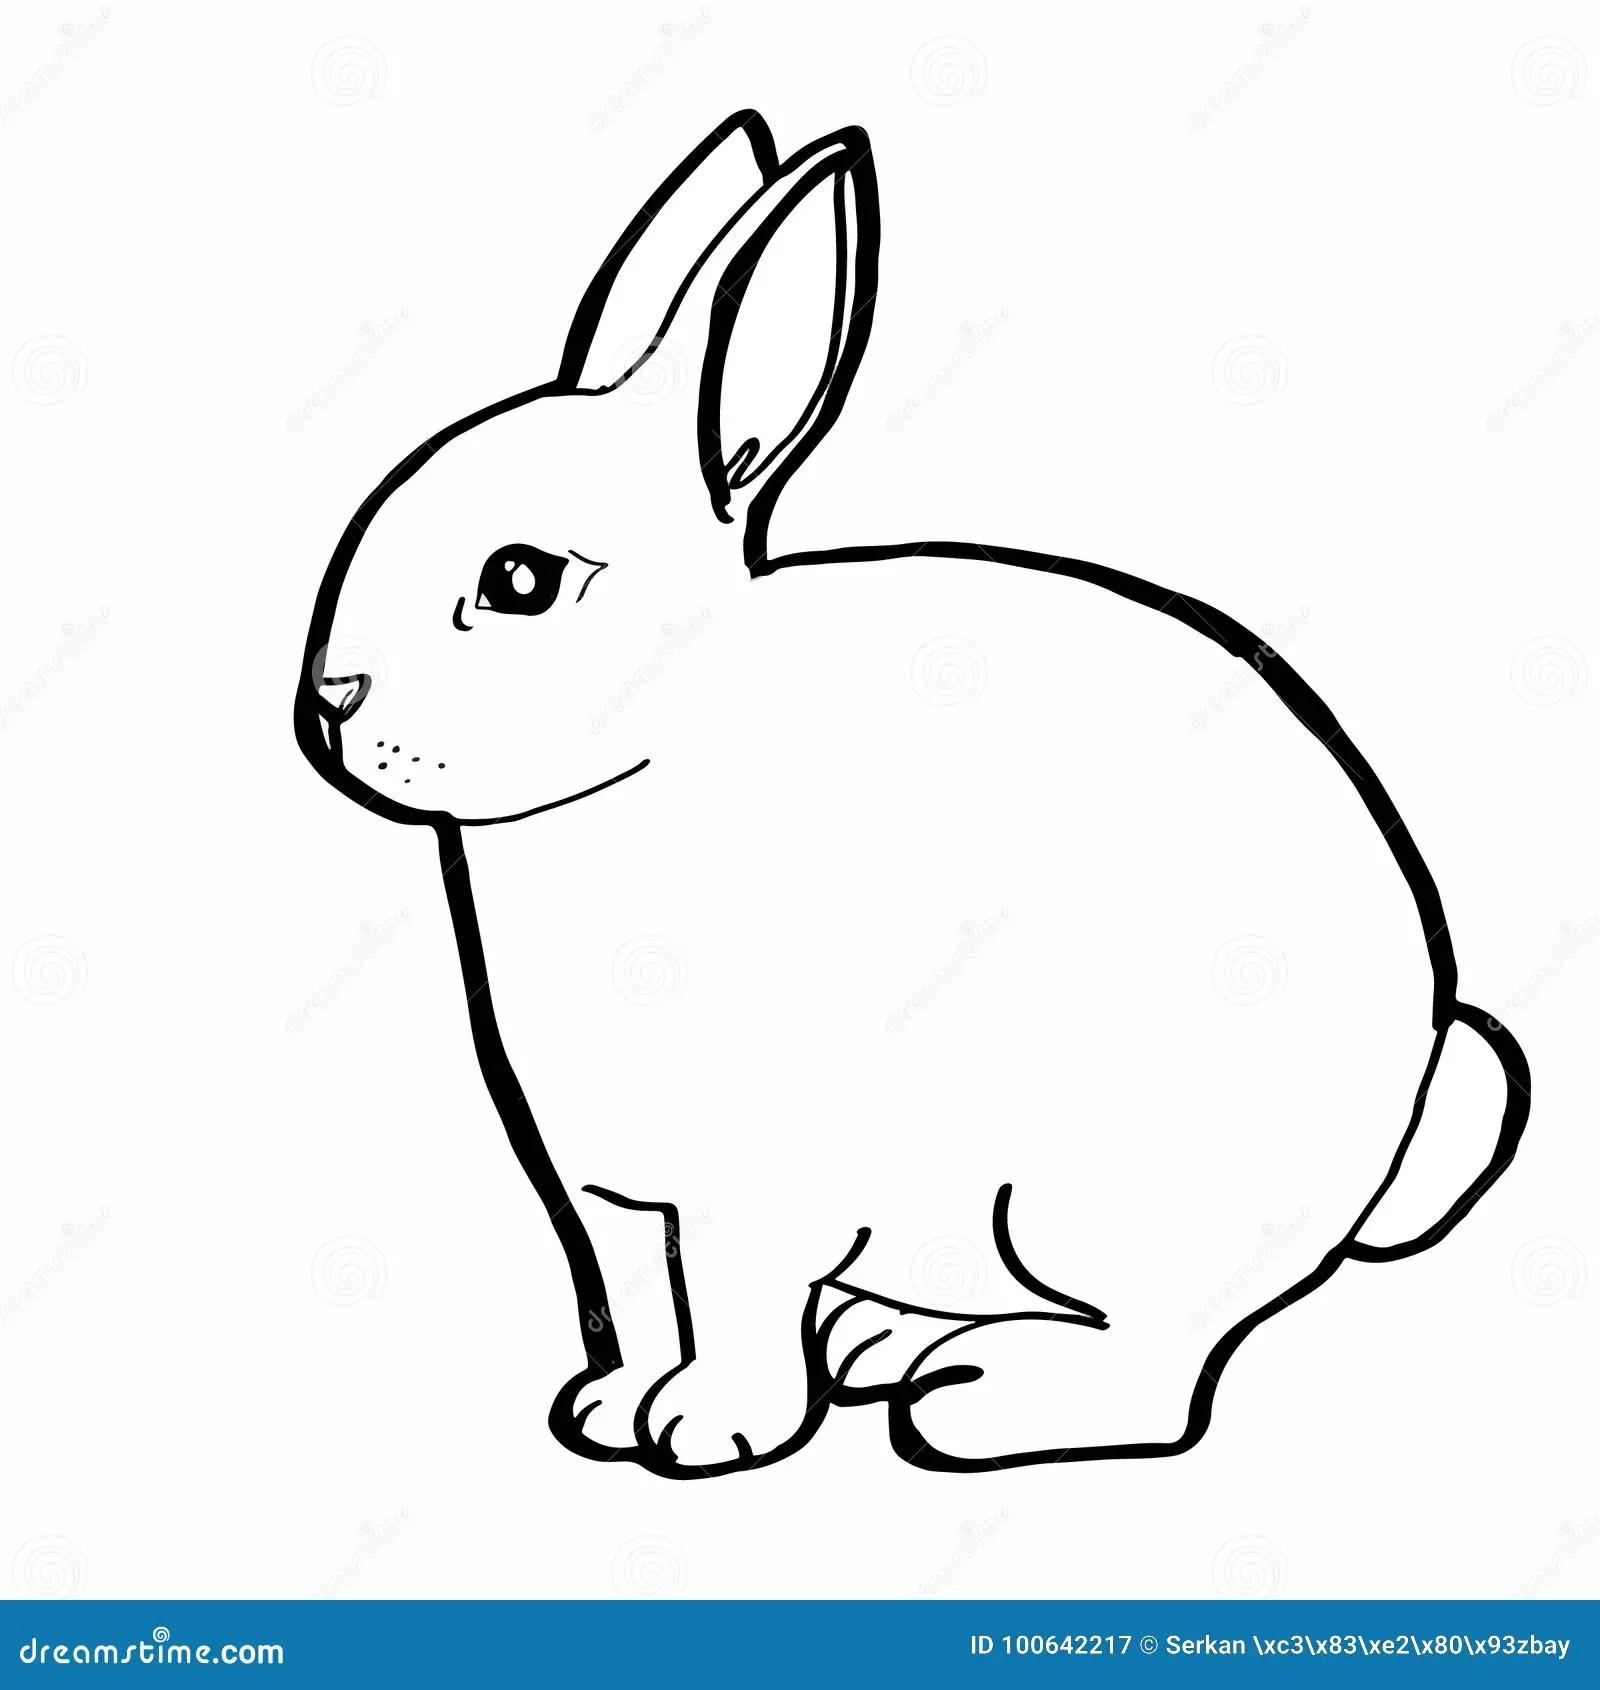 Realistic Rabbit Drawing Stock Vector Illustration Of